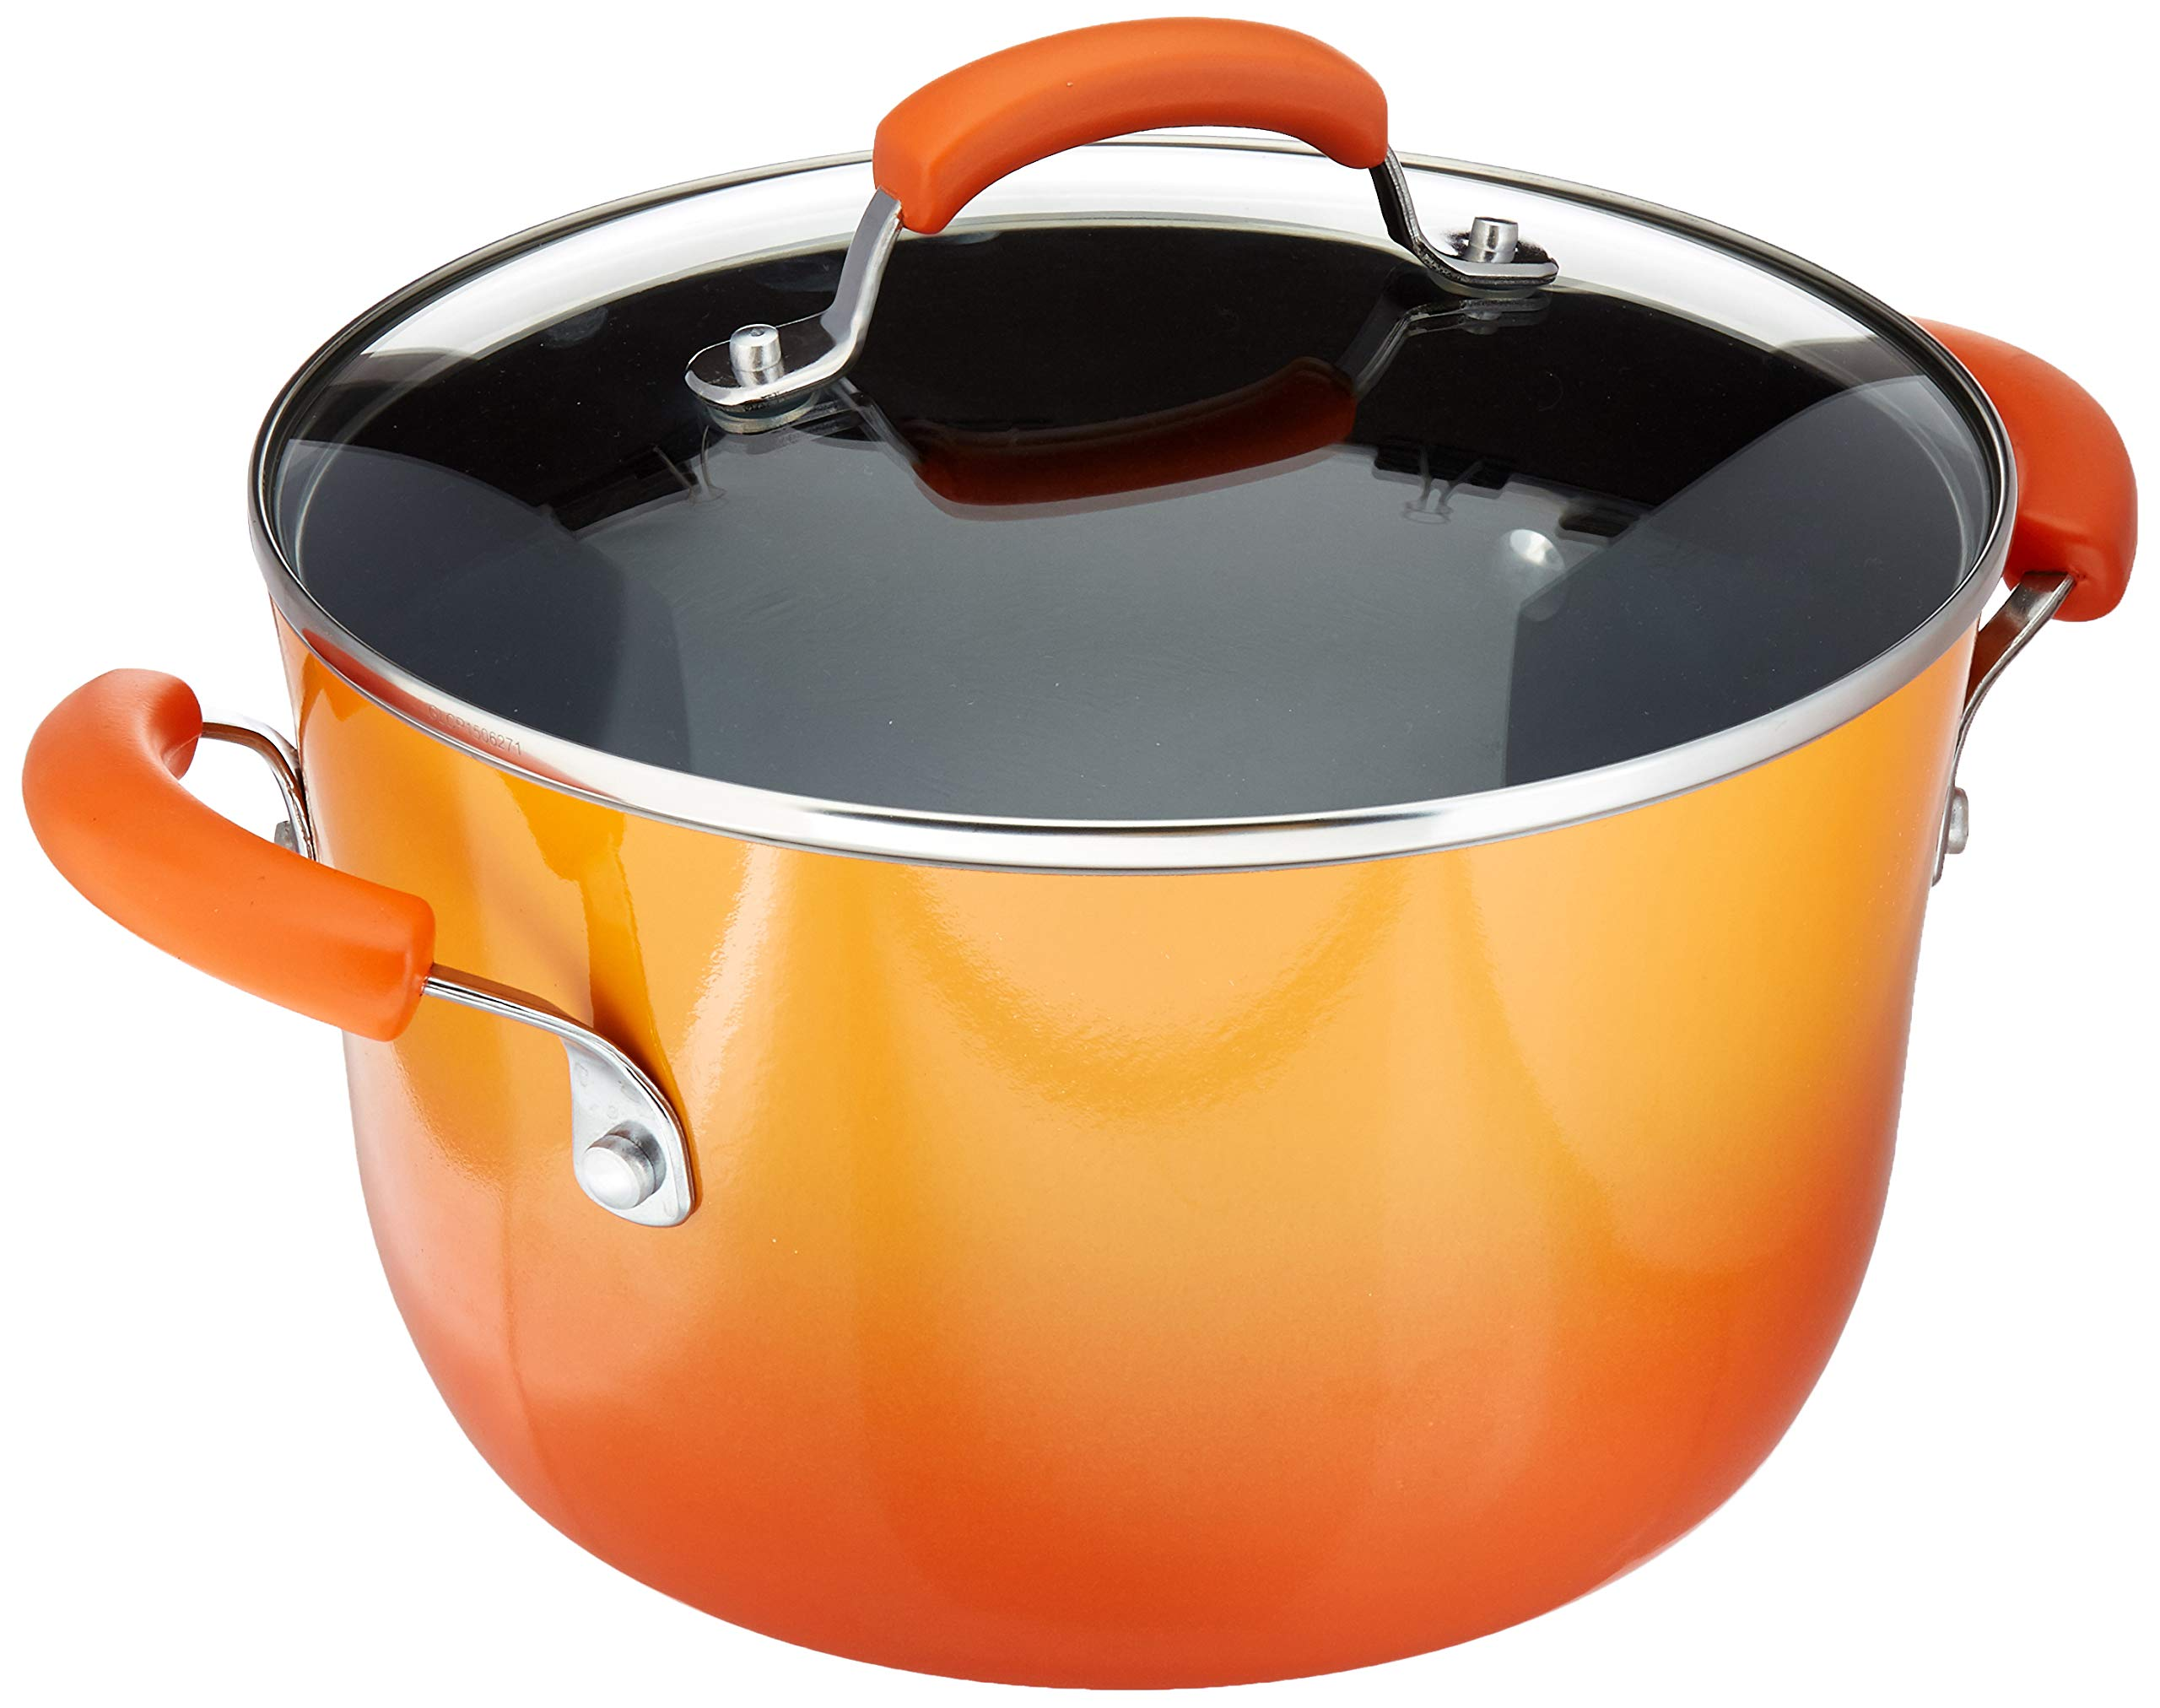 Rachael Ray 16084 Hard Enamel Covered Stockpot 6 Quart Orange Gradient